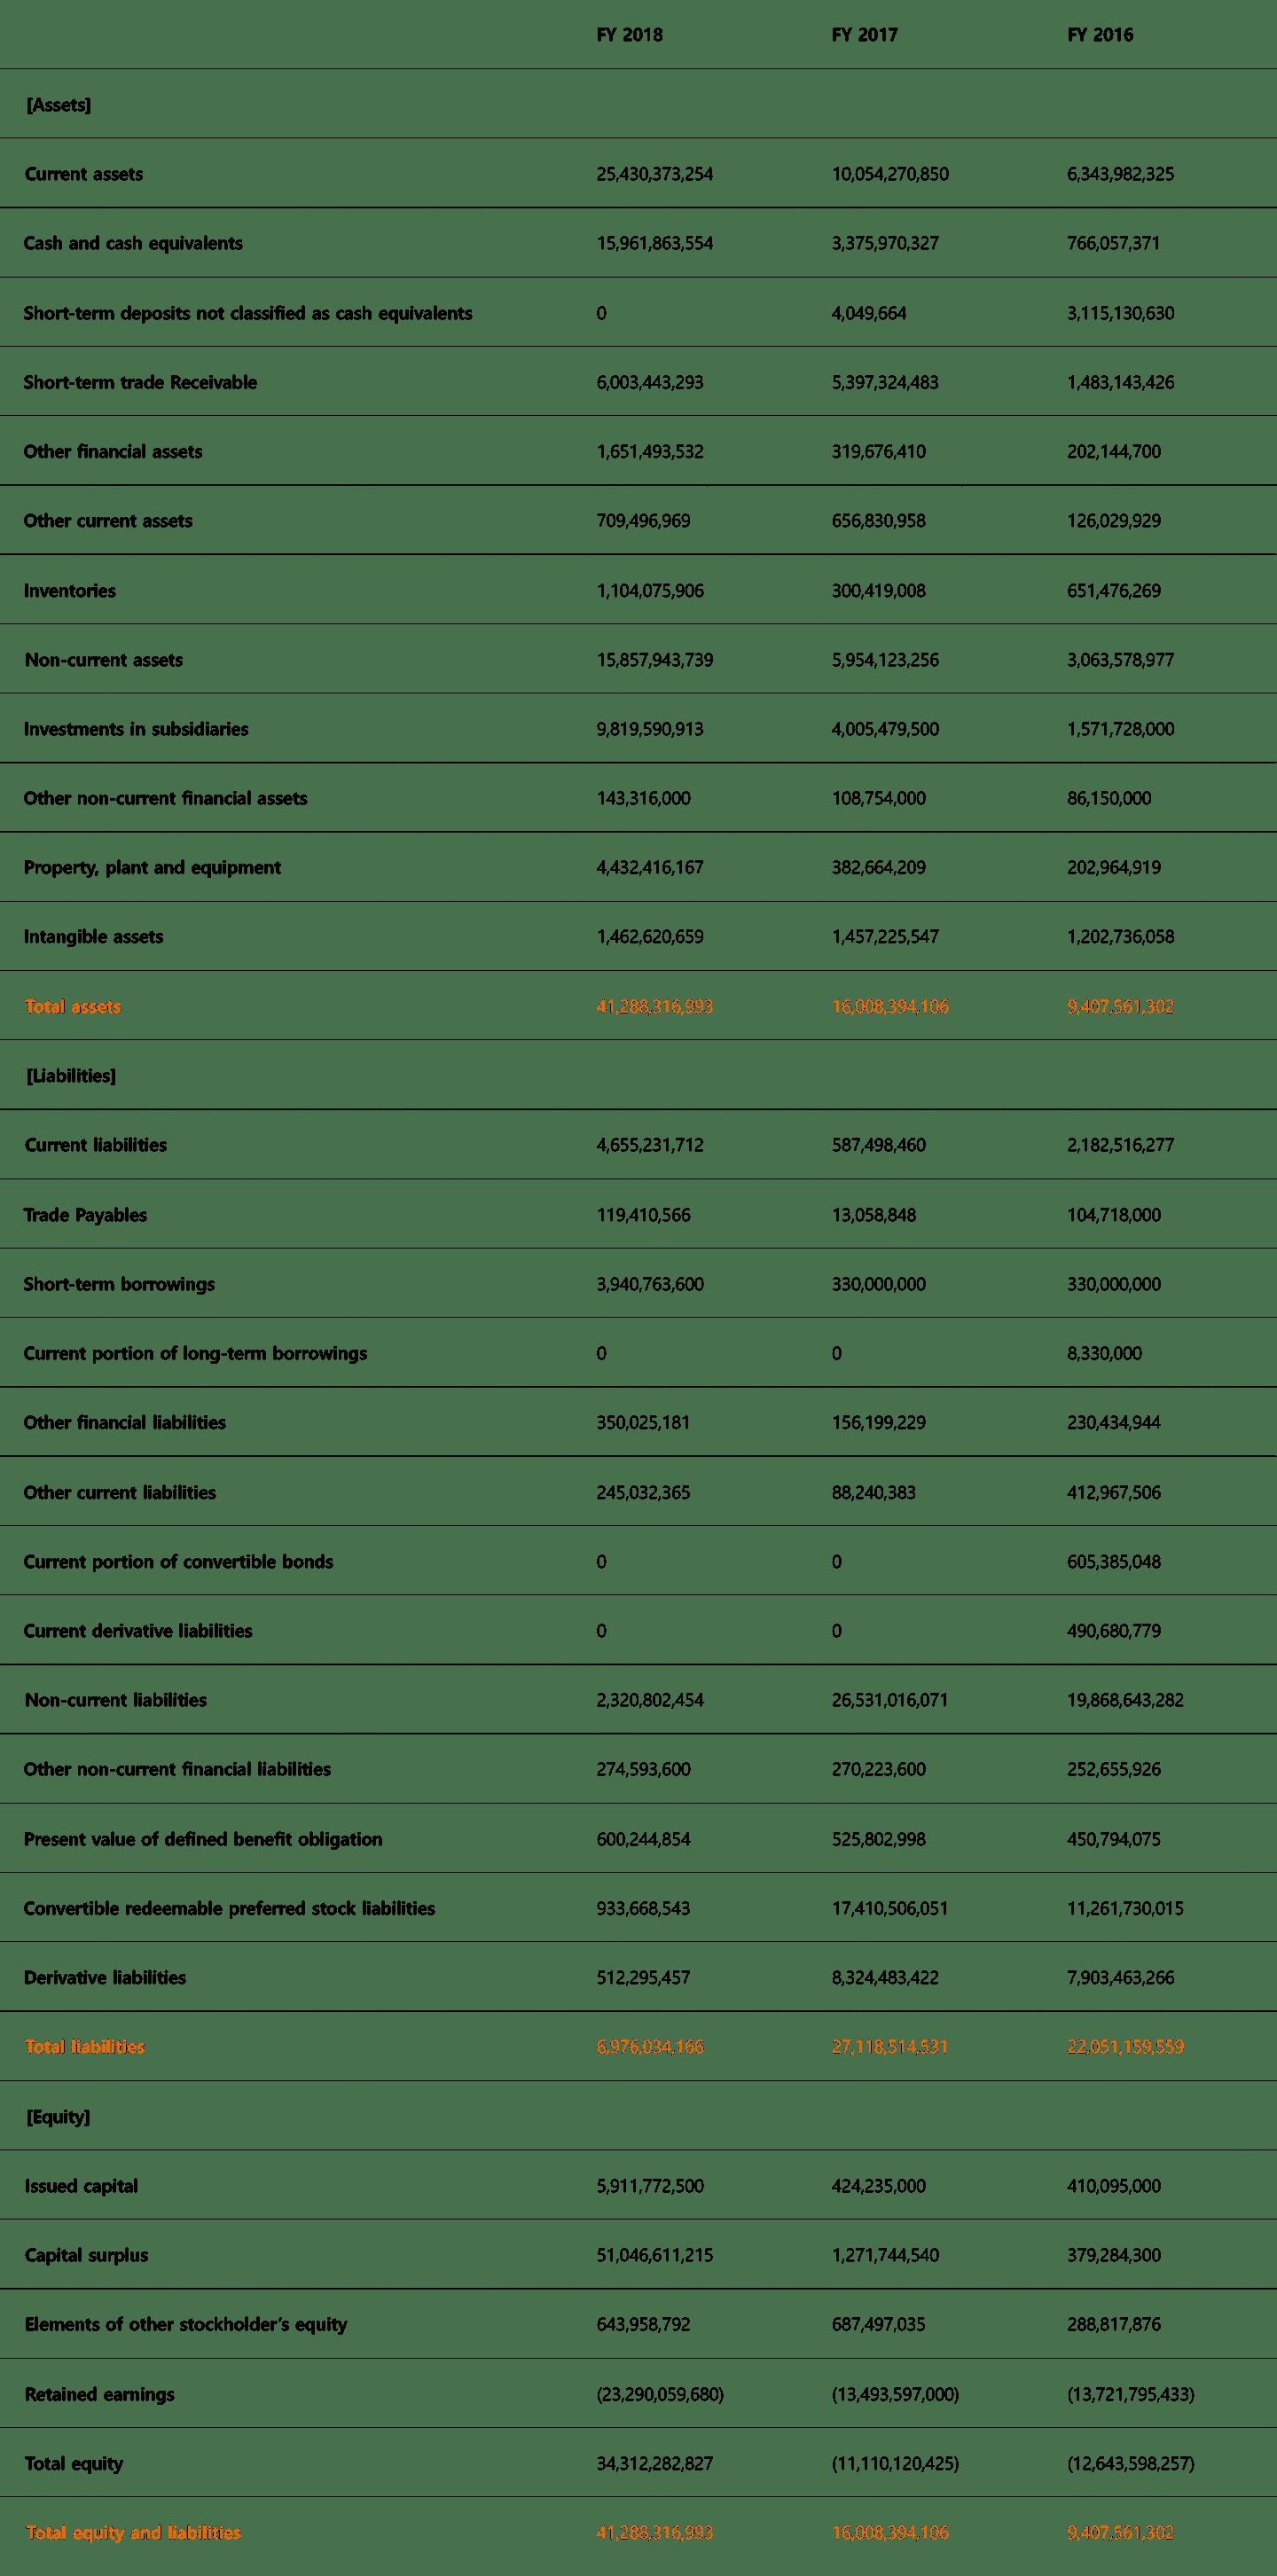 {t('financial-info:page.imageAlt')}